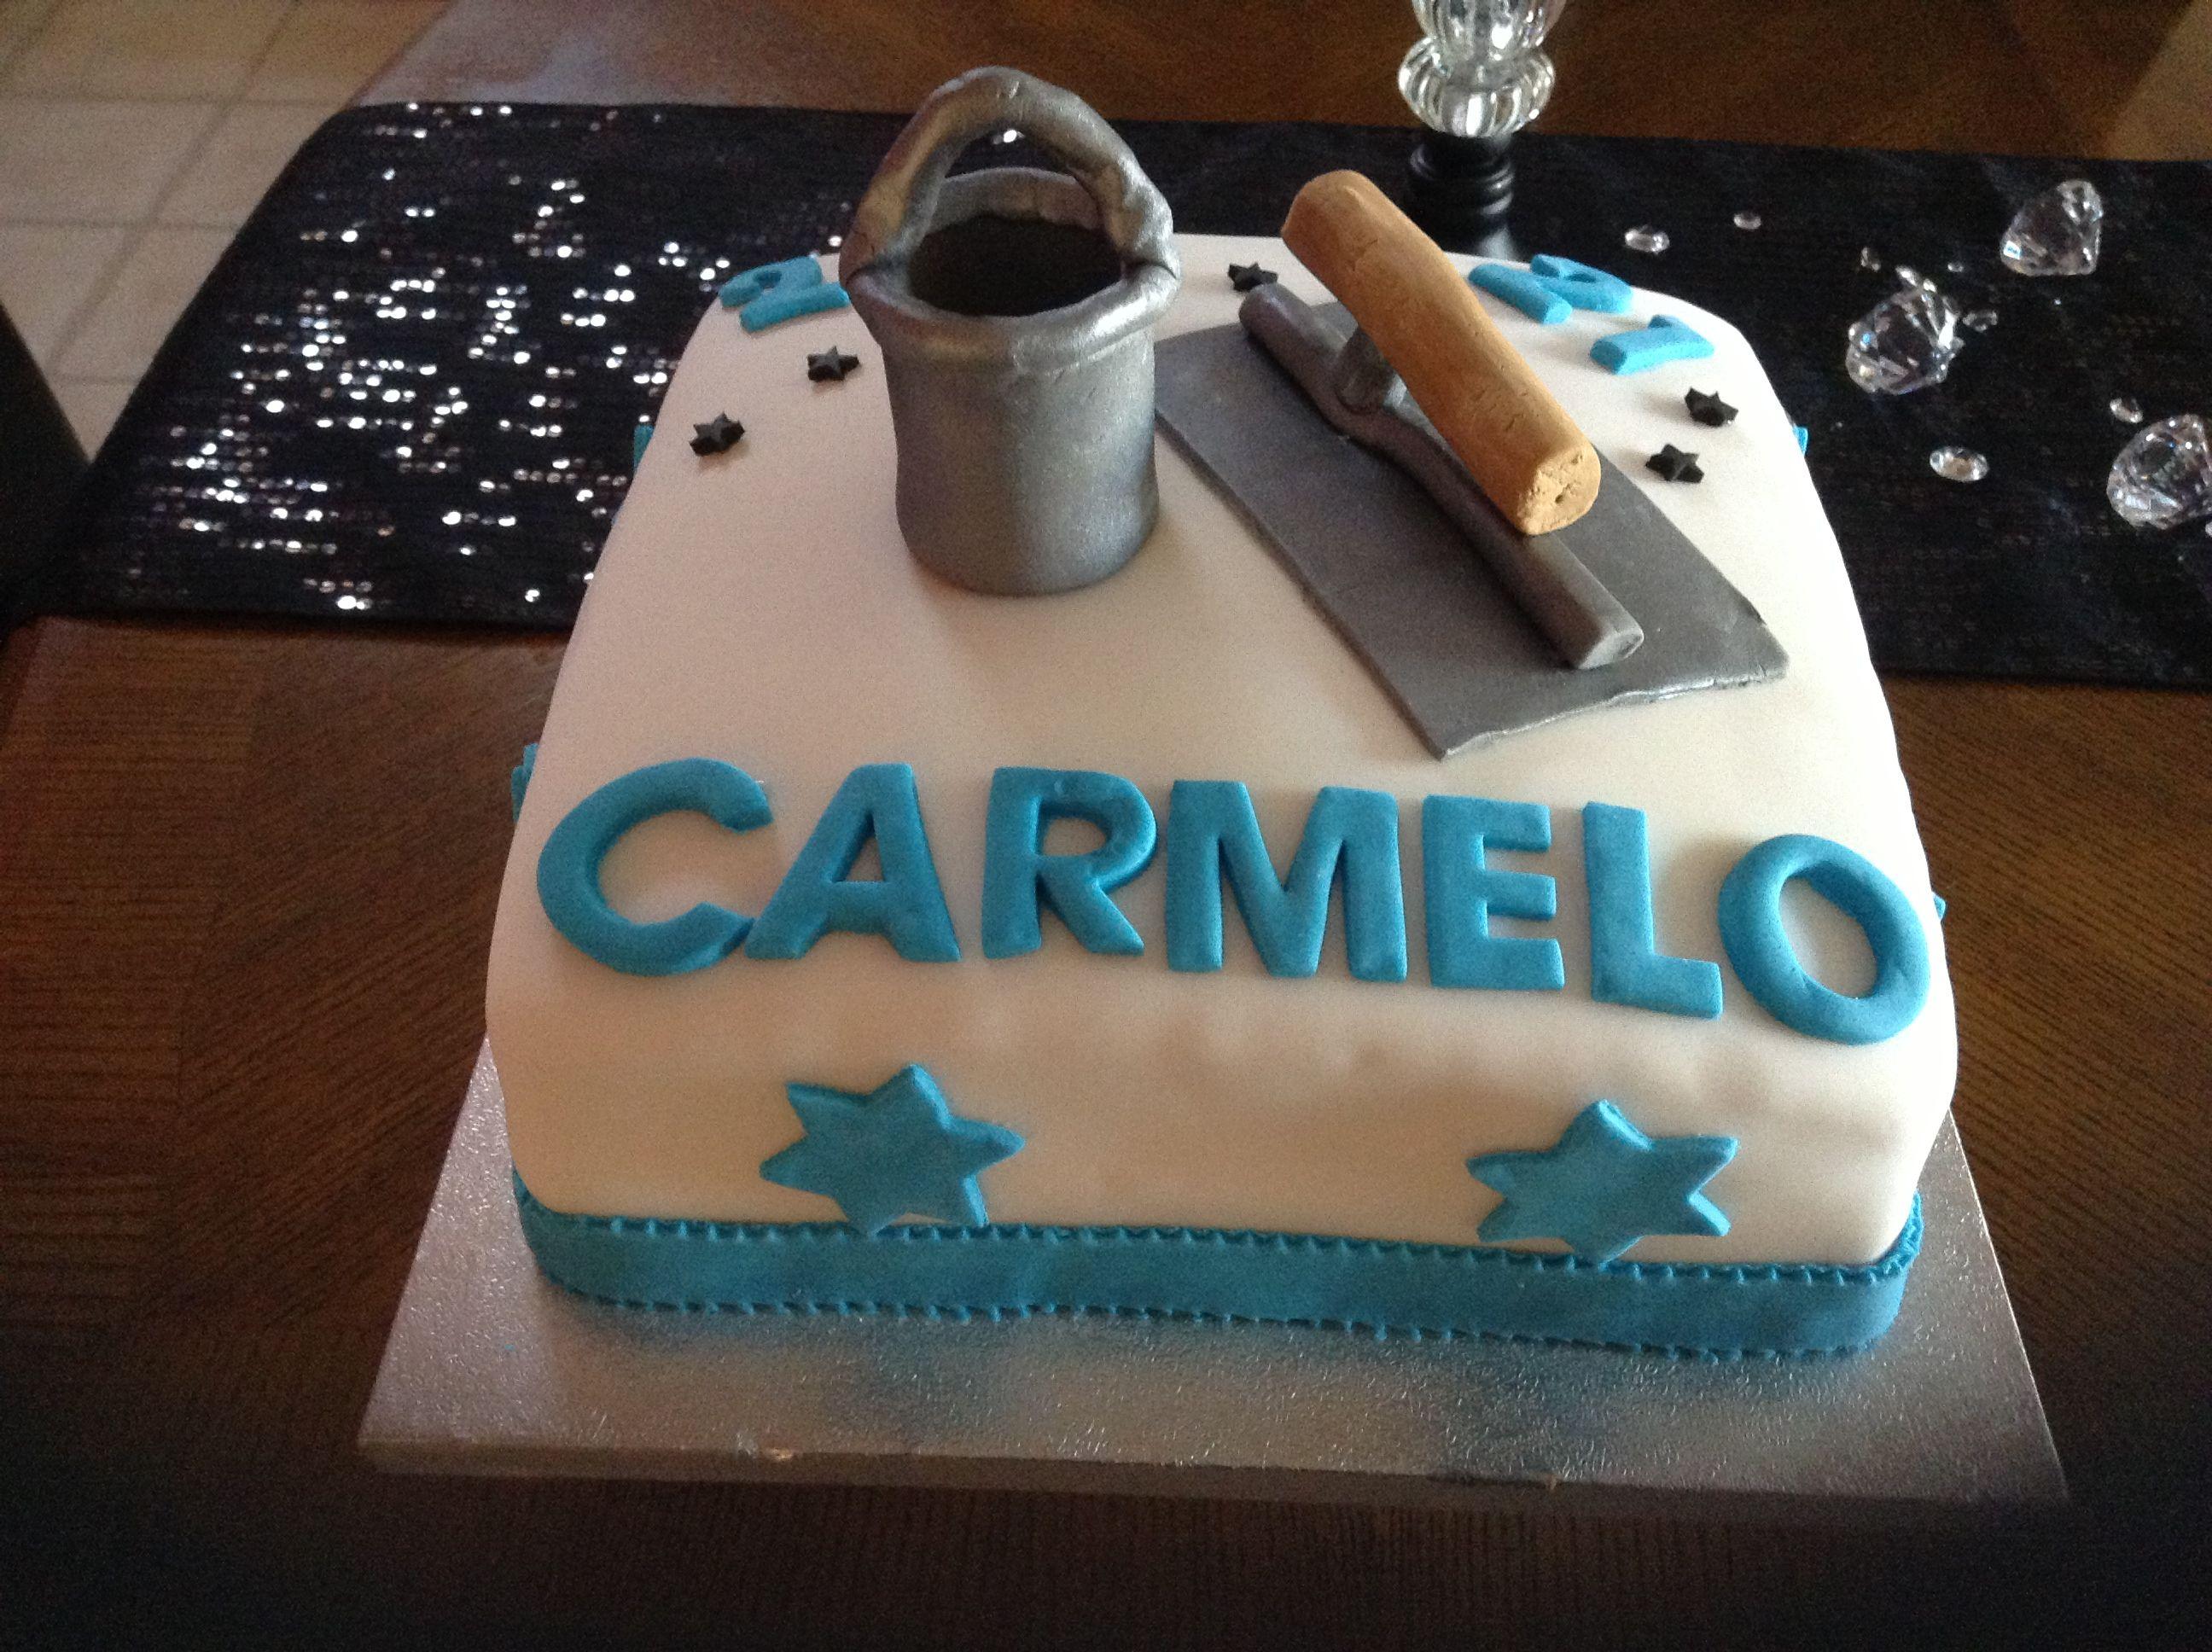 Best Cakes Images On Pinterest Cake Ideas Mini Cakes And - Birthday cakes encinitas